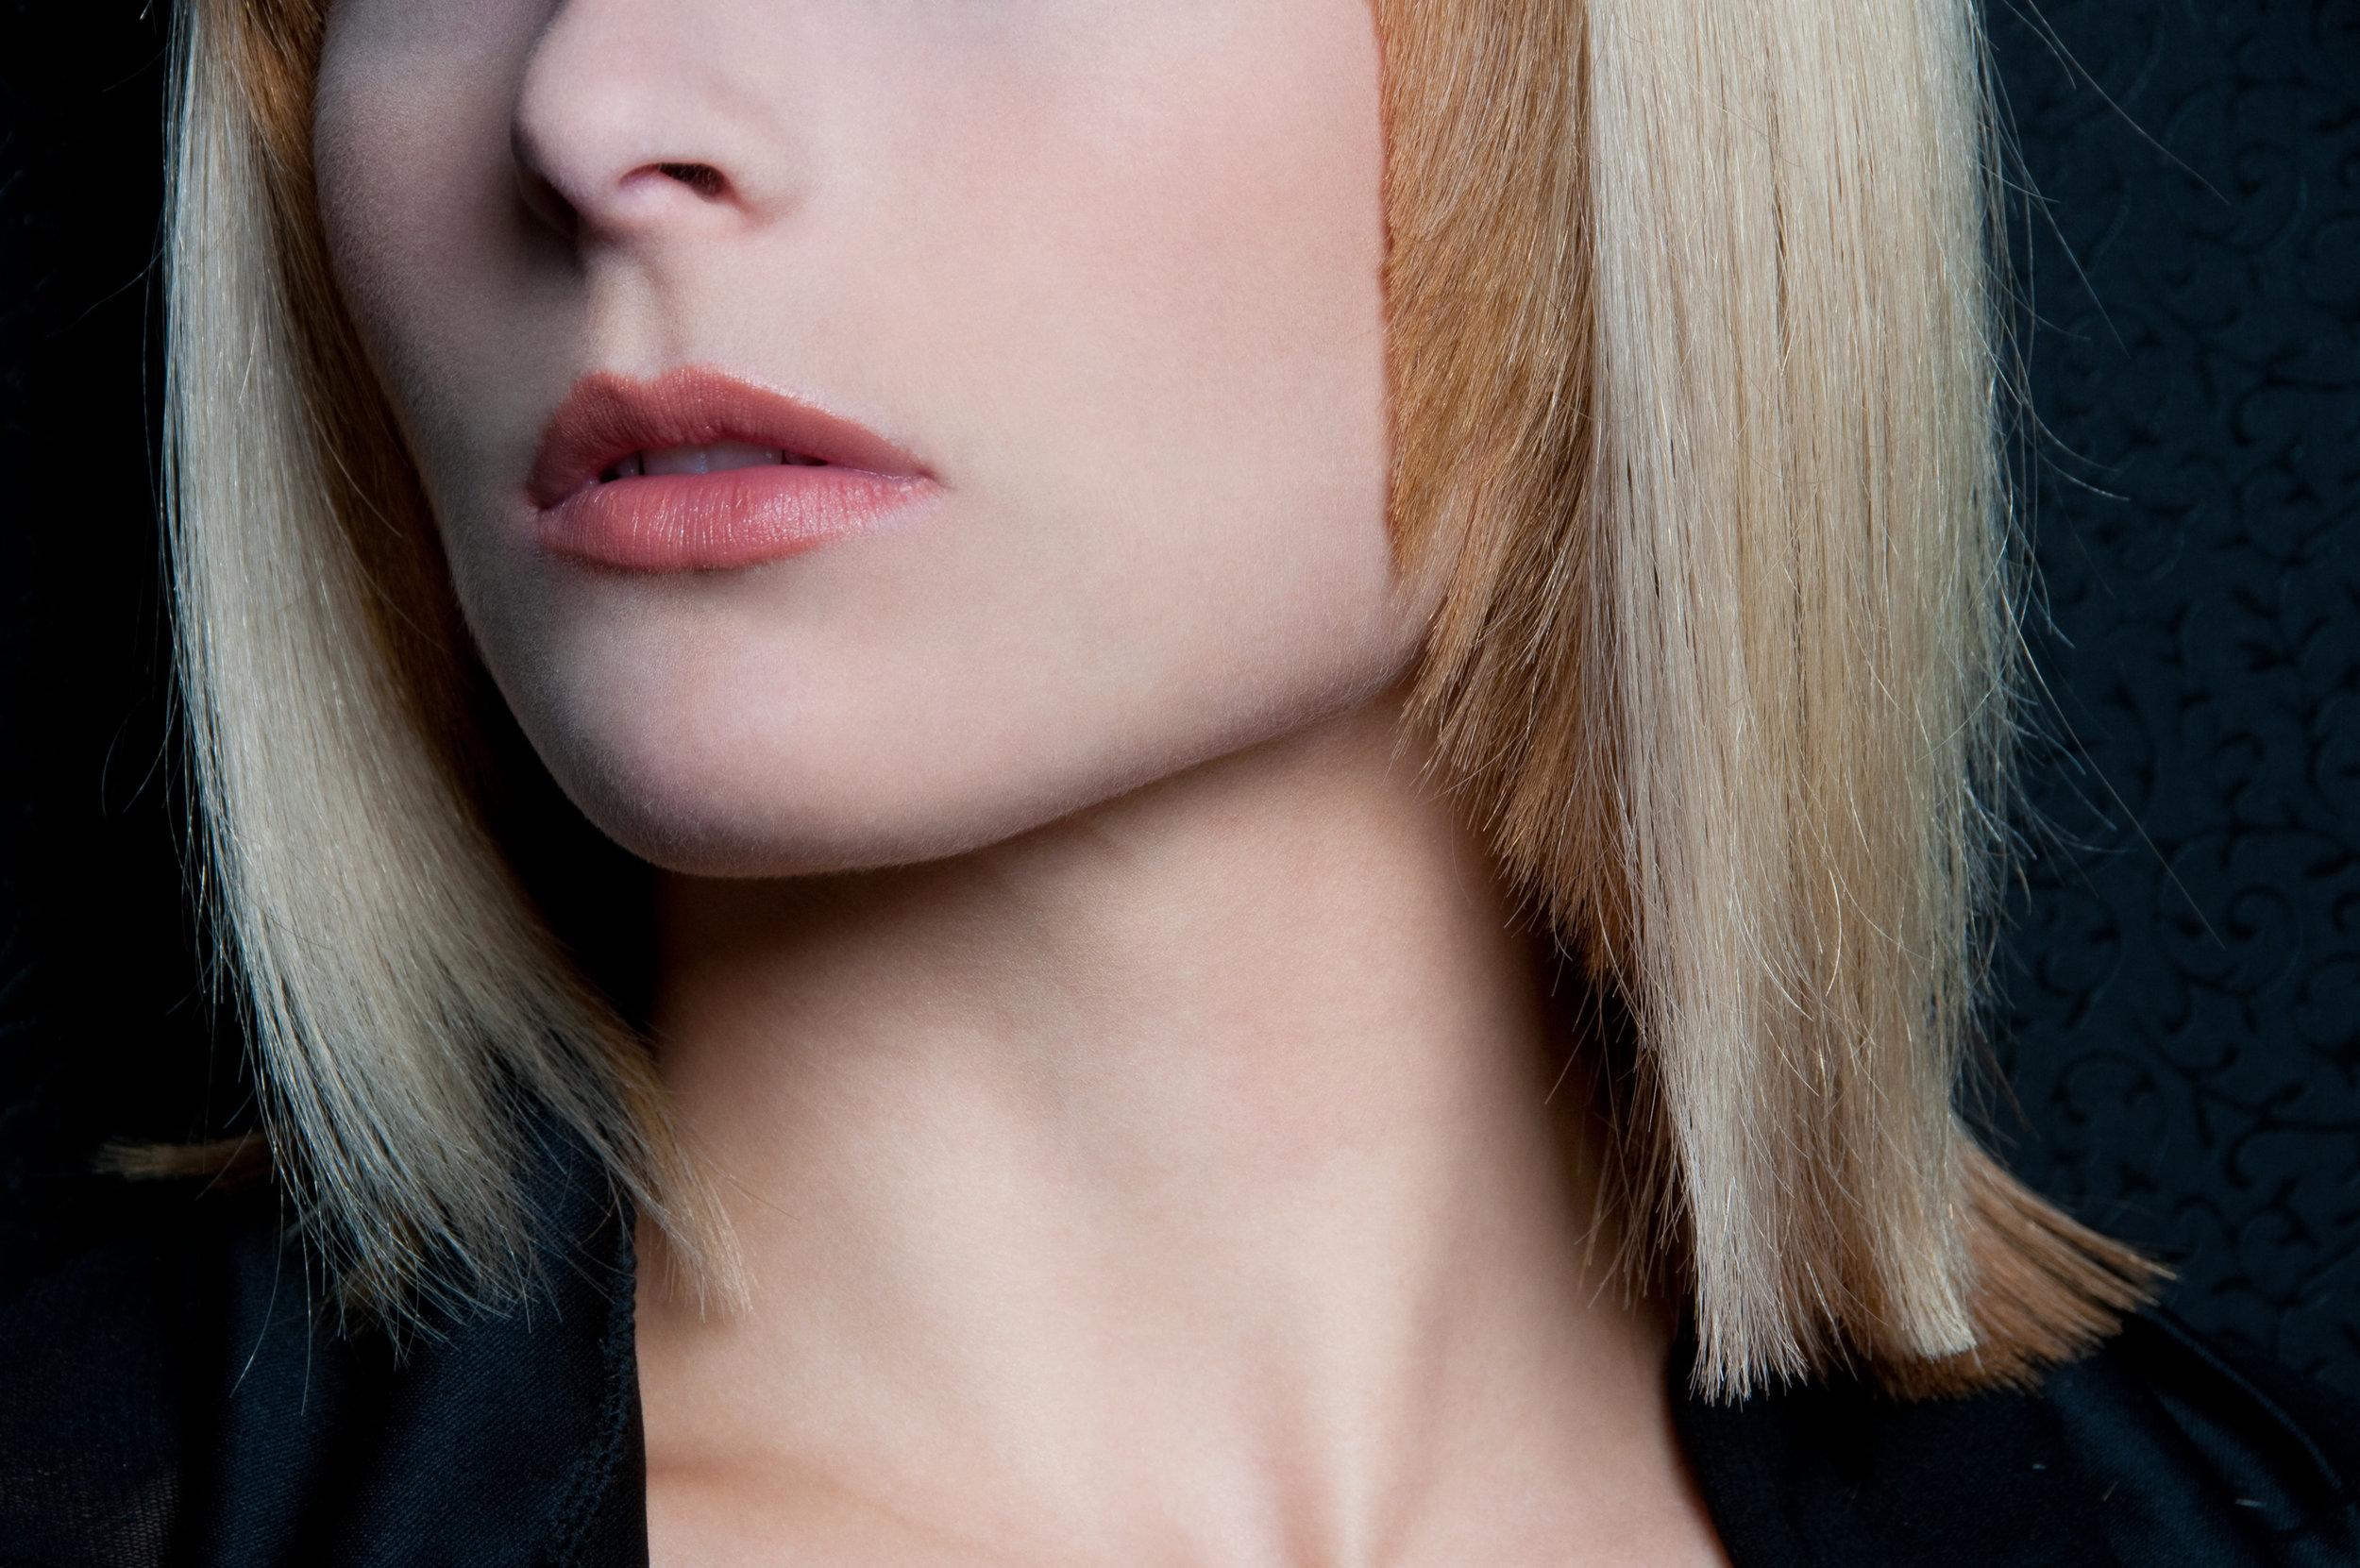 HairbyHiramLavin-007.jpg